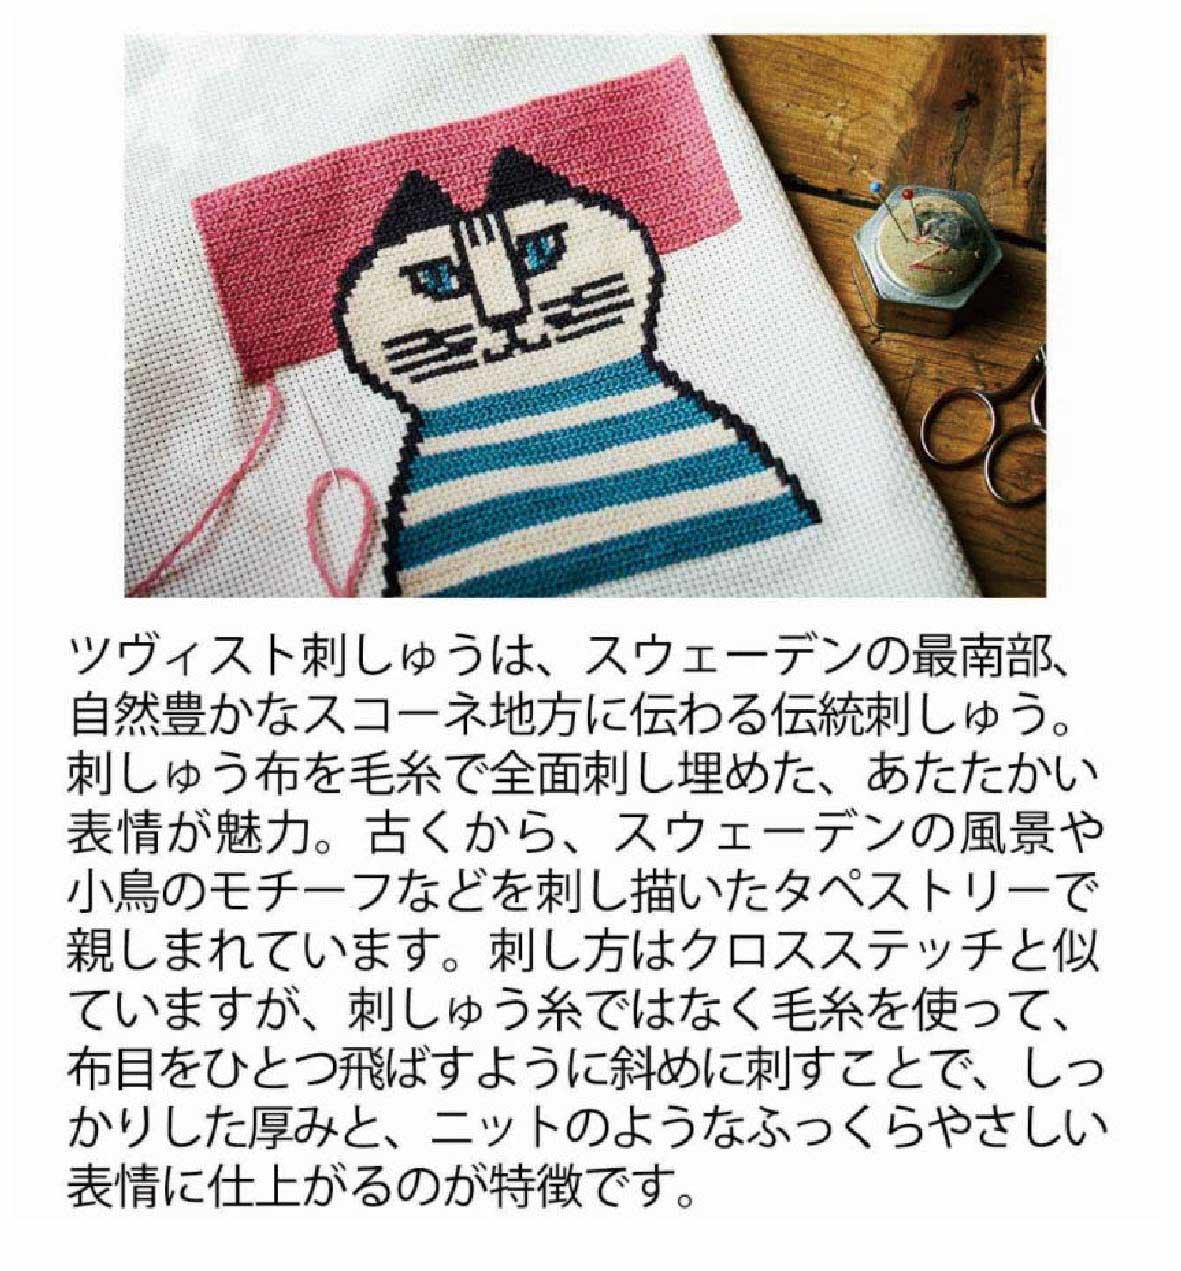 【TK】【11月中旬以降順次出荷予定】ツヴィスト刺しゅうのキャラクタータペストリーキット(ミンミ)